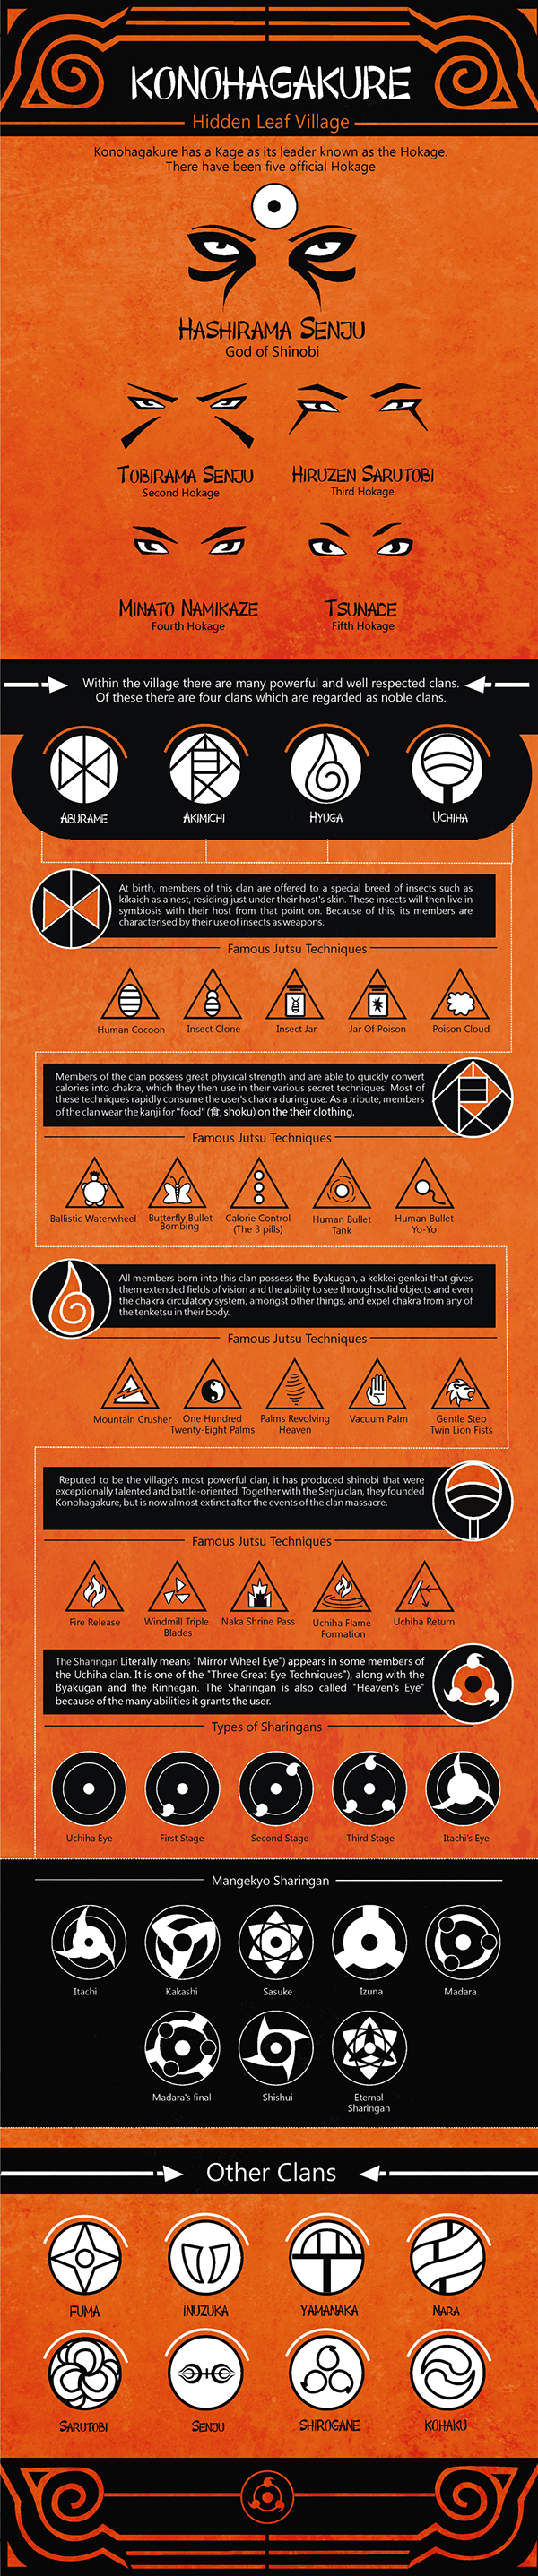 Naruto Infographic : The Clans of Konoha  on Behance